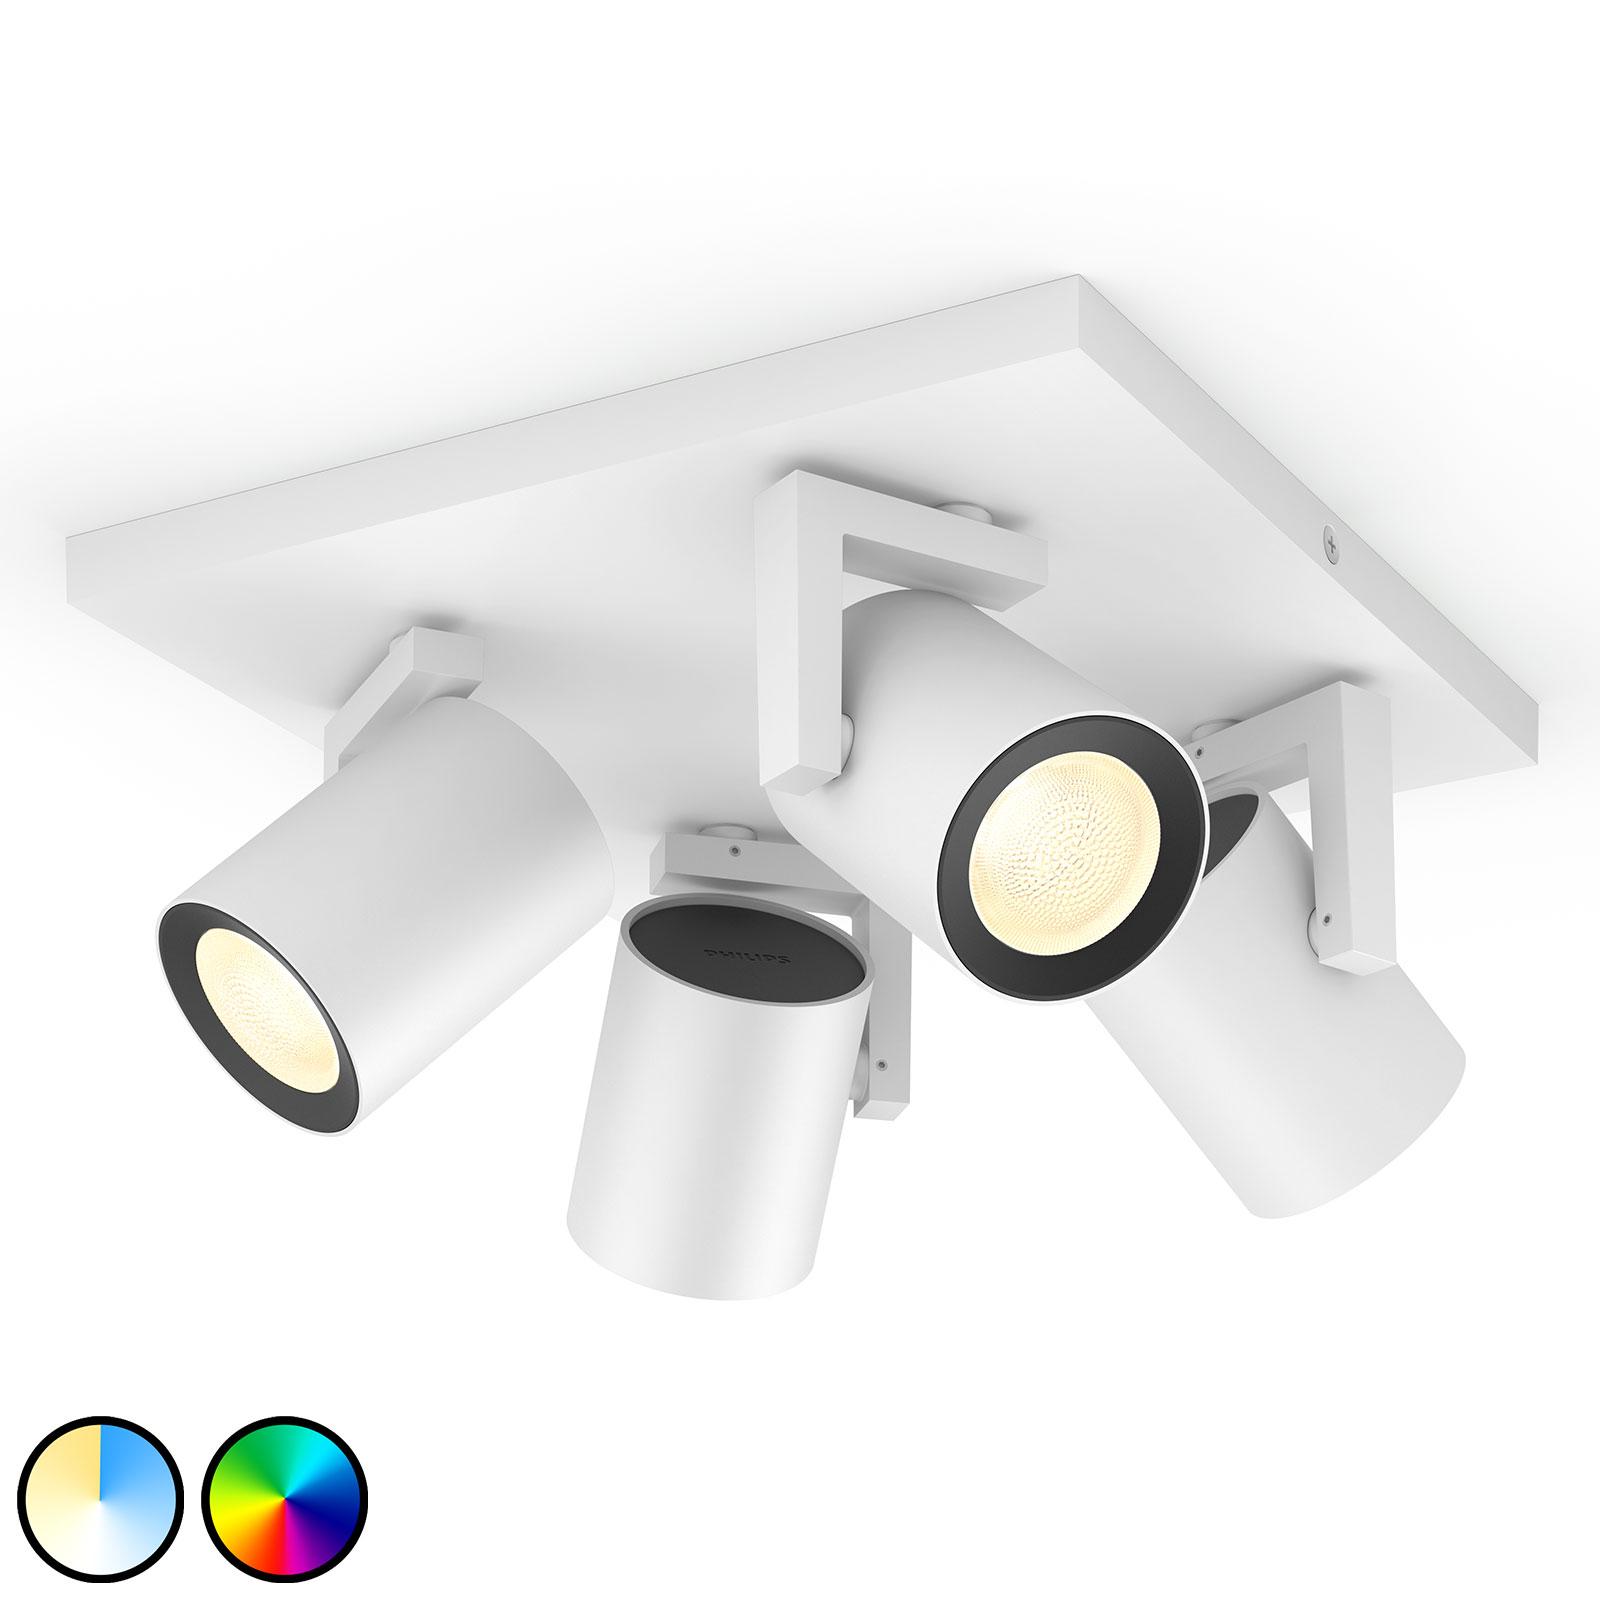 Philips Hue Argenta foco LED, 4 luces, blanco